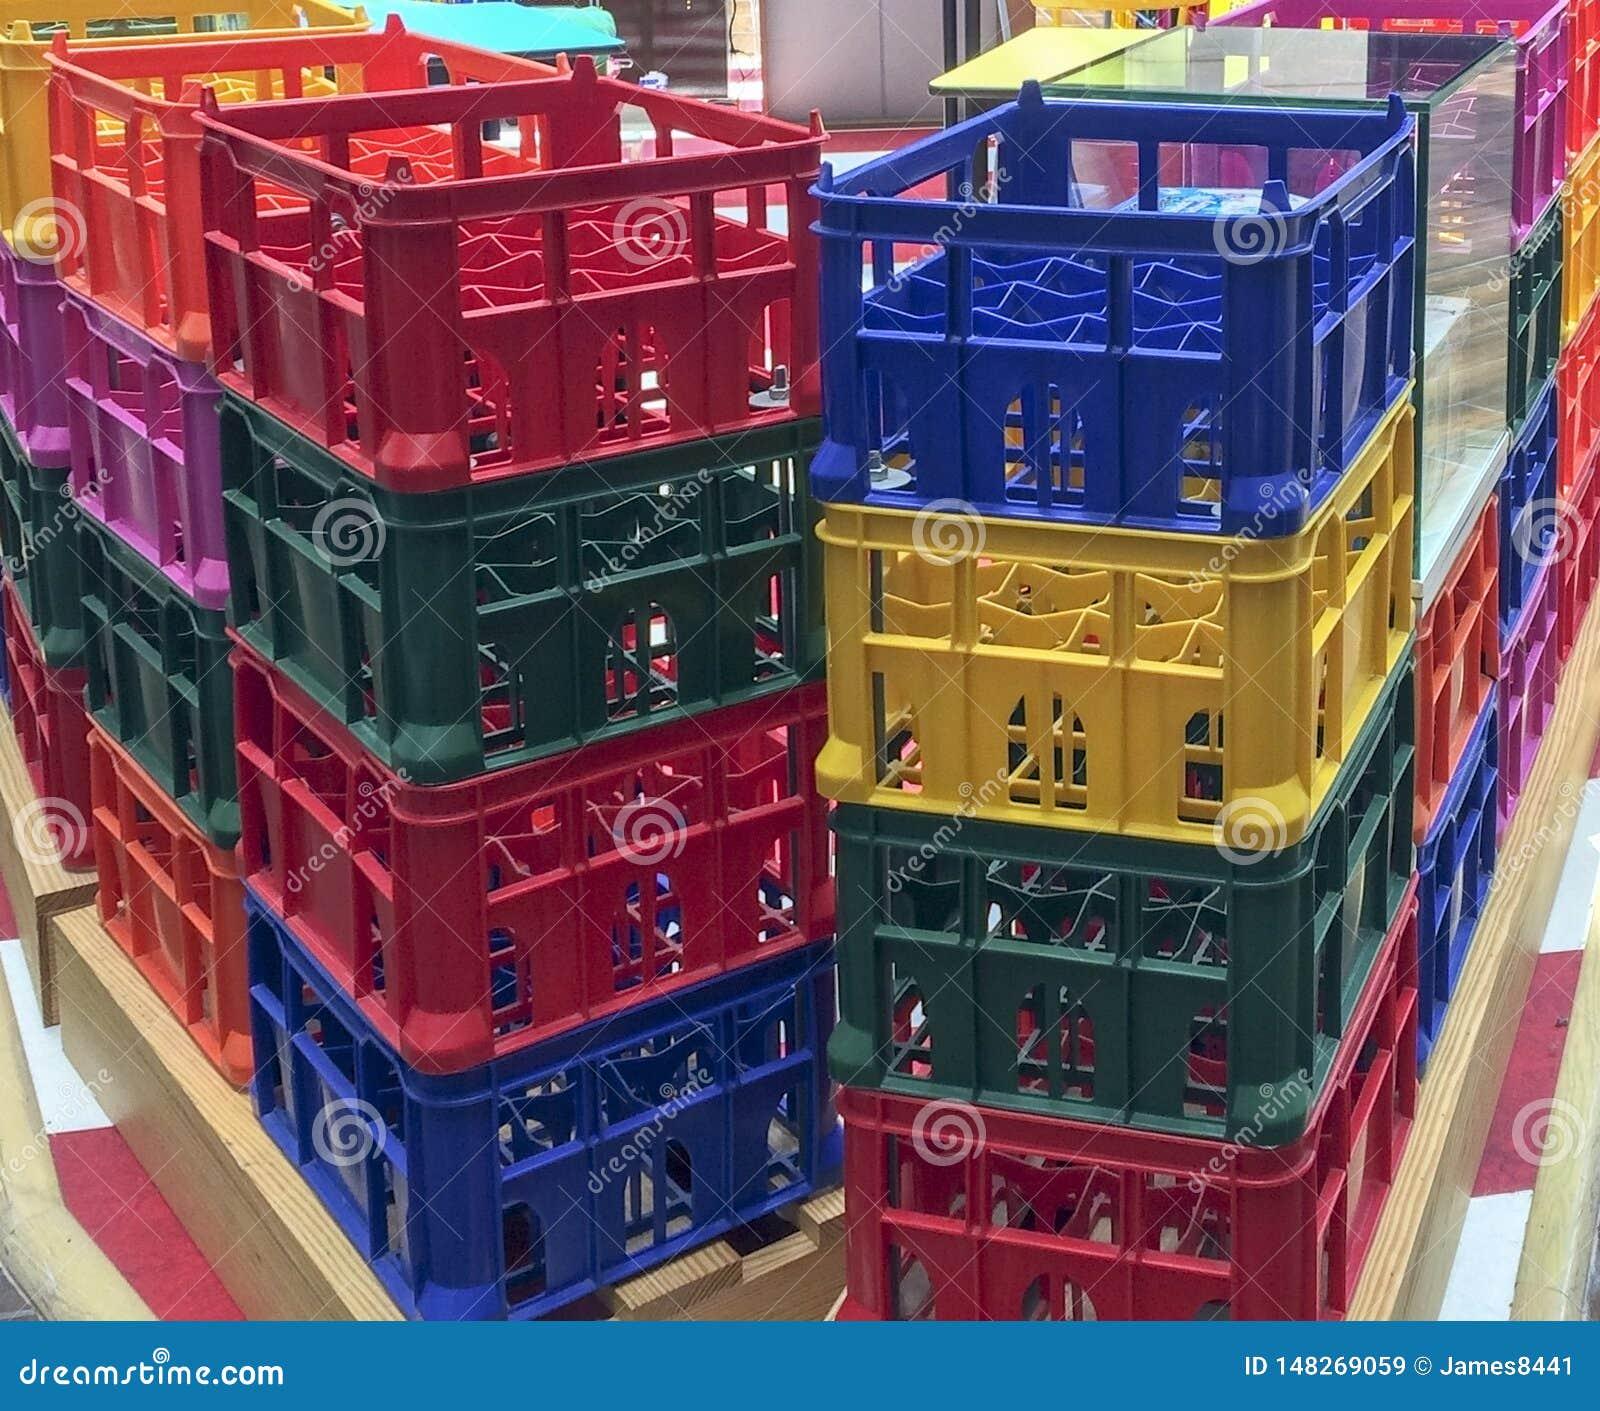 Bright colorful plastic boxes.